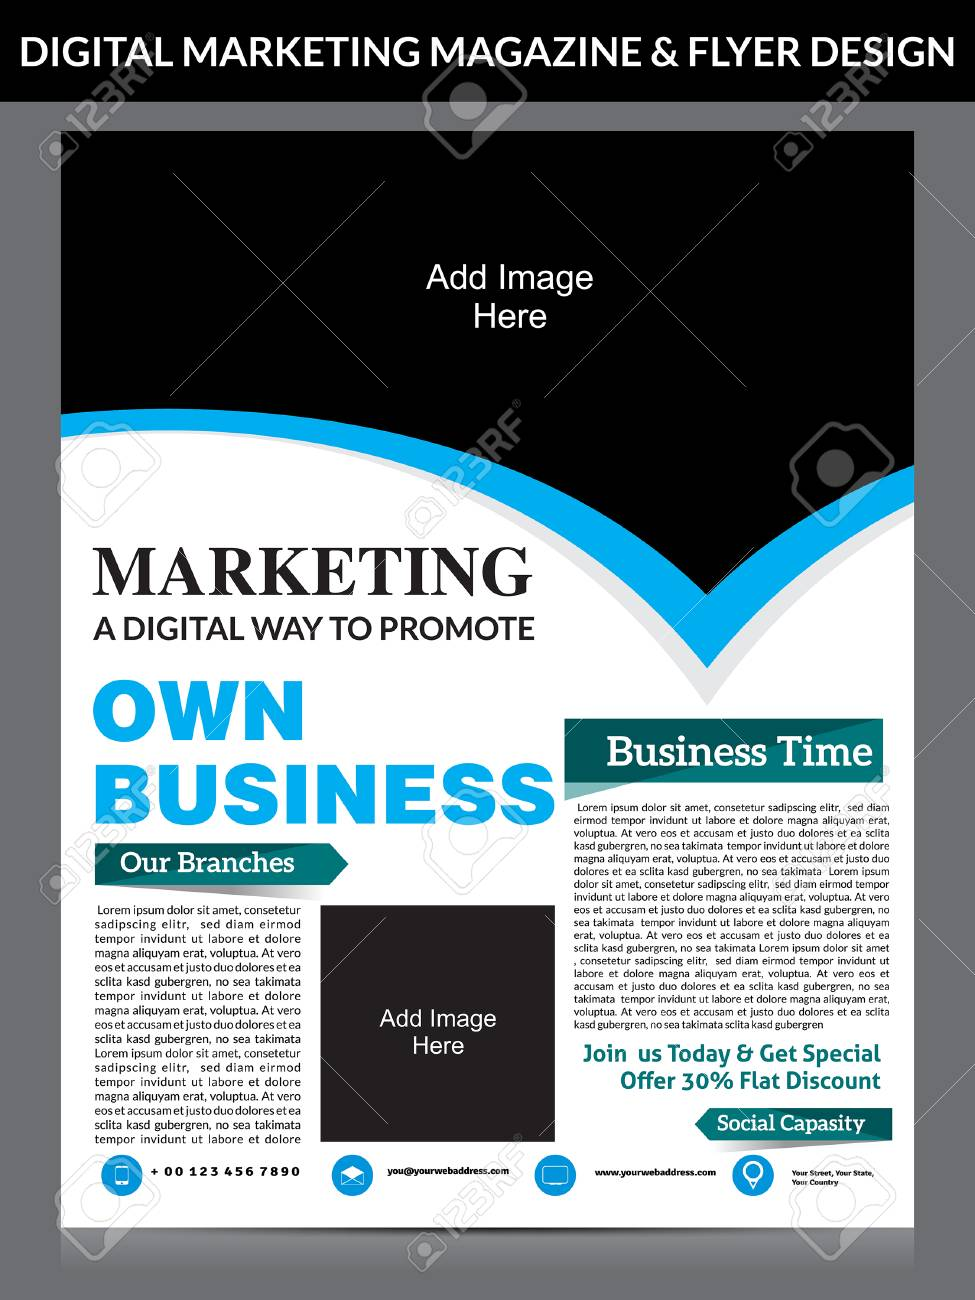 Digital Marketing Flyer Magazine Design Template Vector Illustration